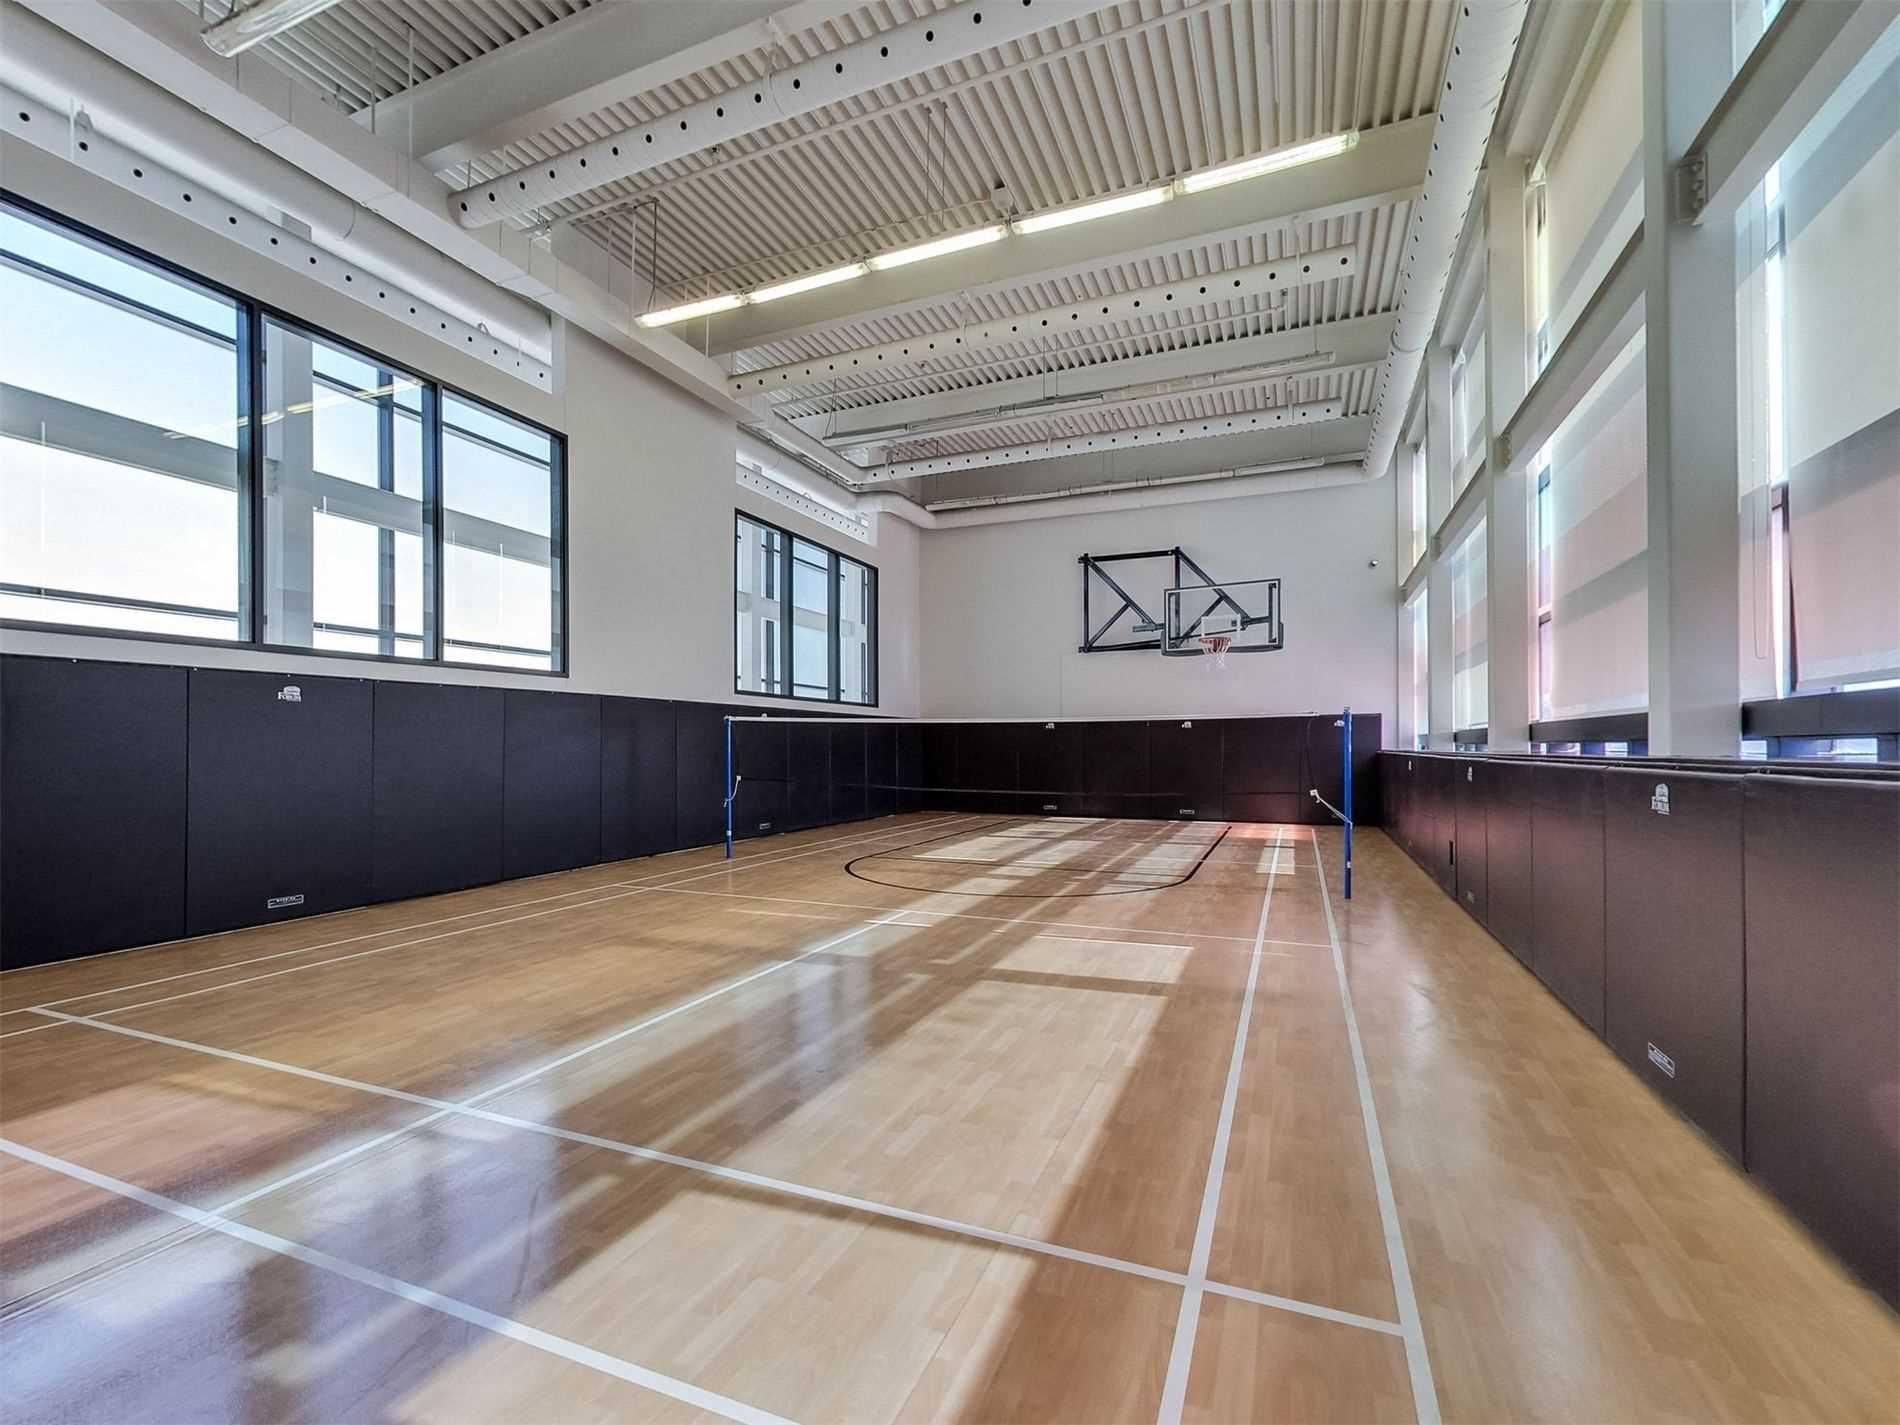 Photo 19: Photos: 501 29 Singer Court in Toronto: Bayview Village Condo for sale (Toronto C15)  : MLS®# C4614510